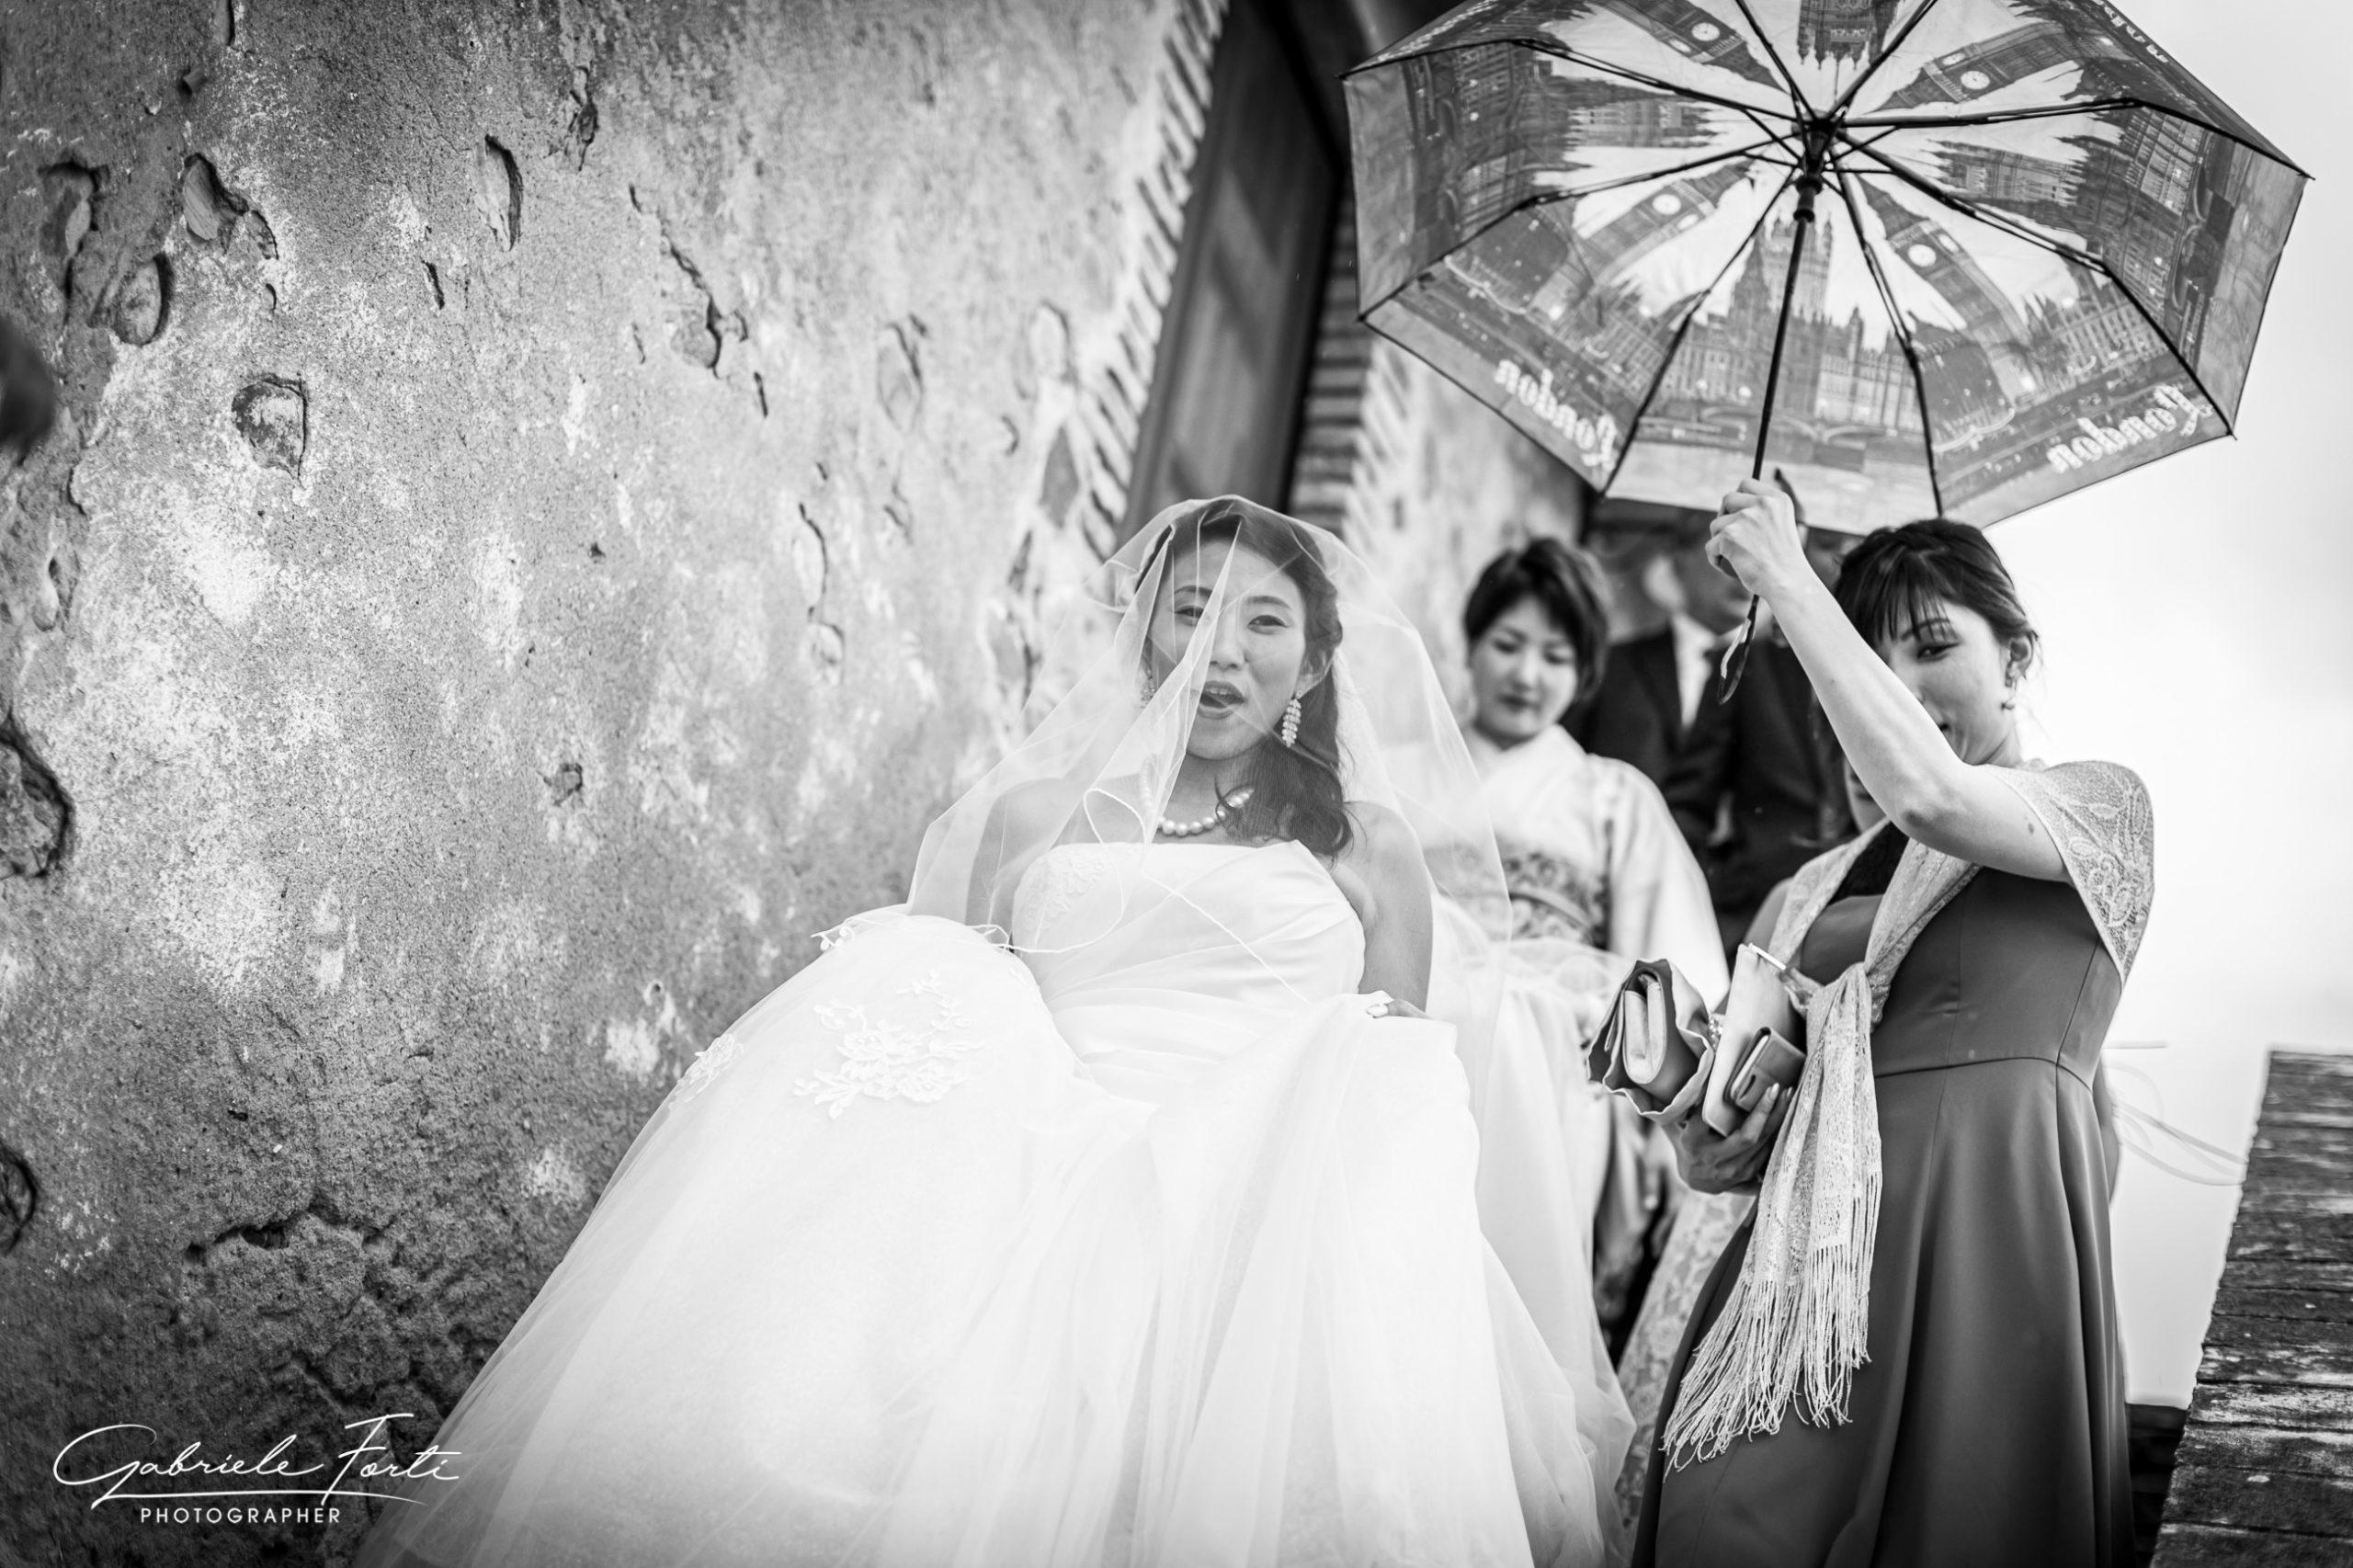 wedding-japan-tuscany-locanda-in-tuscany-photographer-siena-foto-forti-gabriele-7